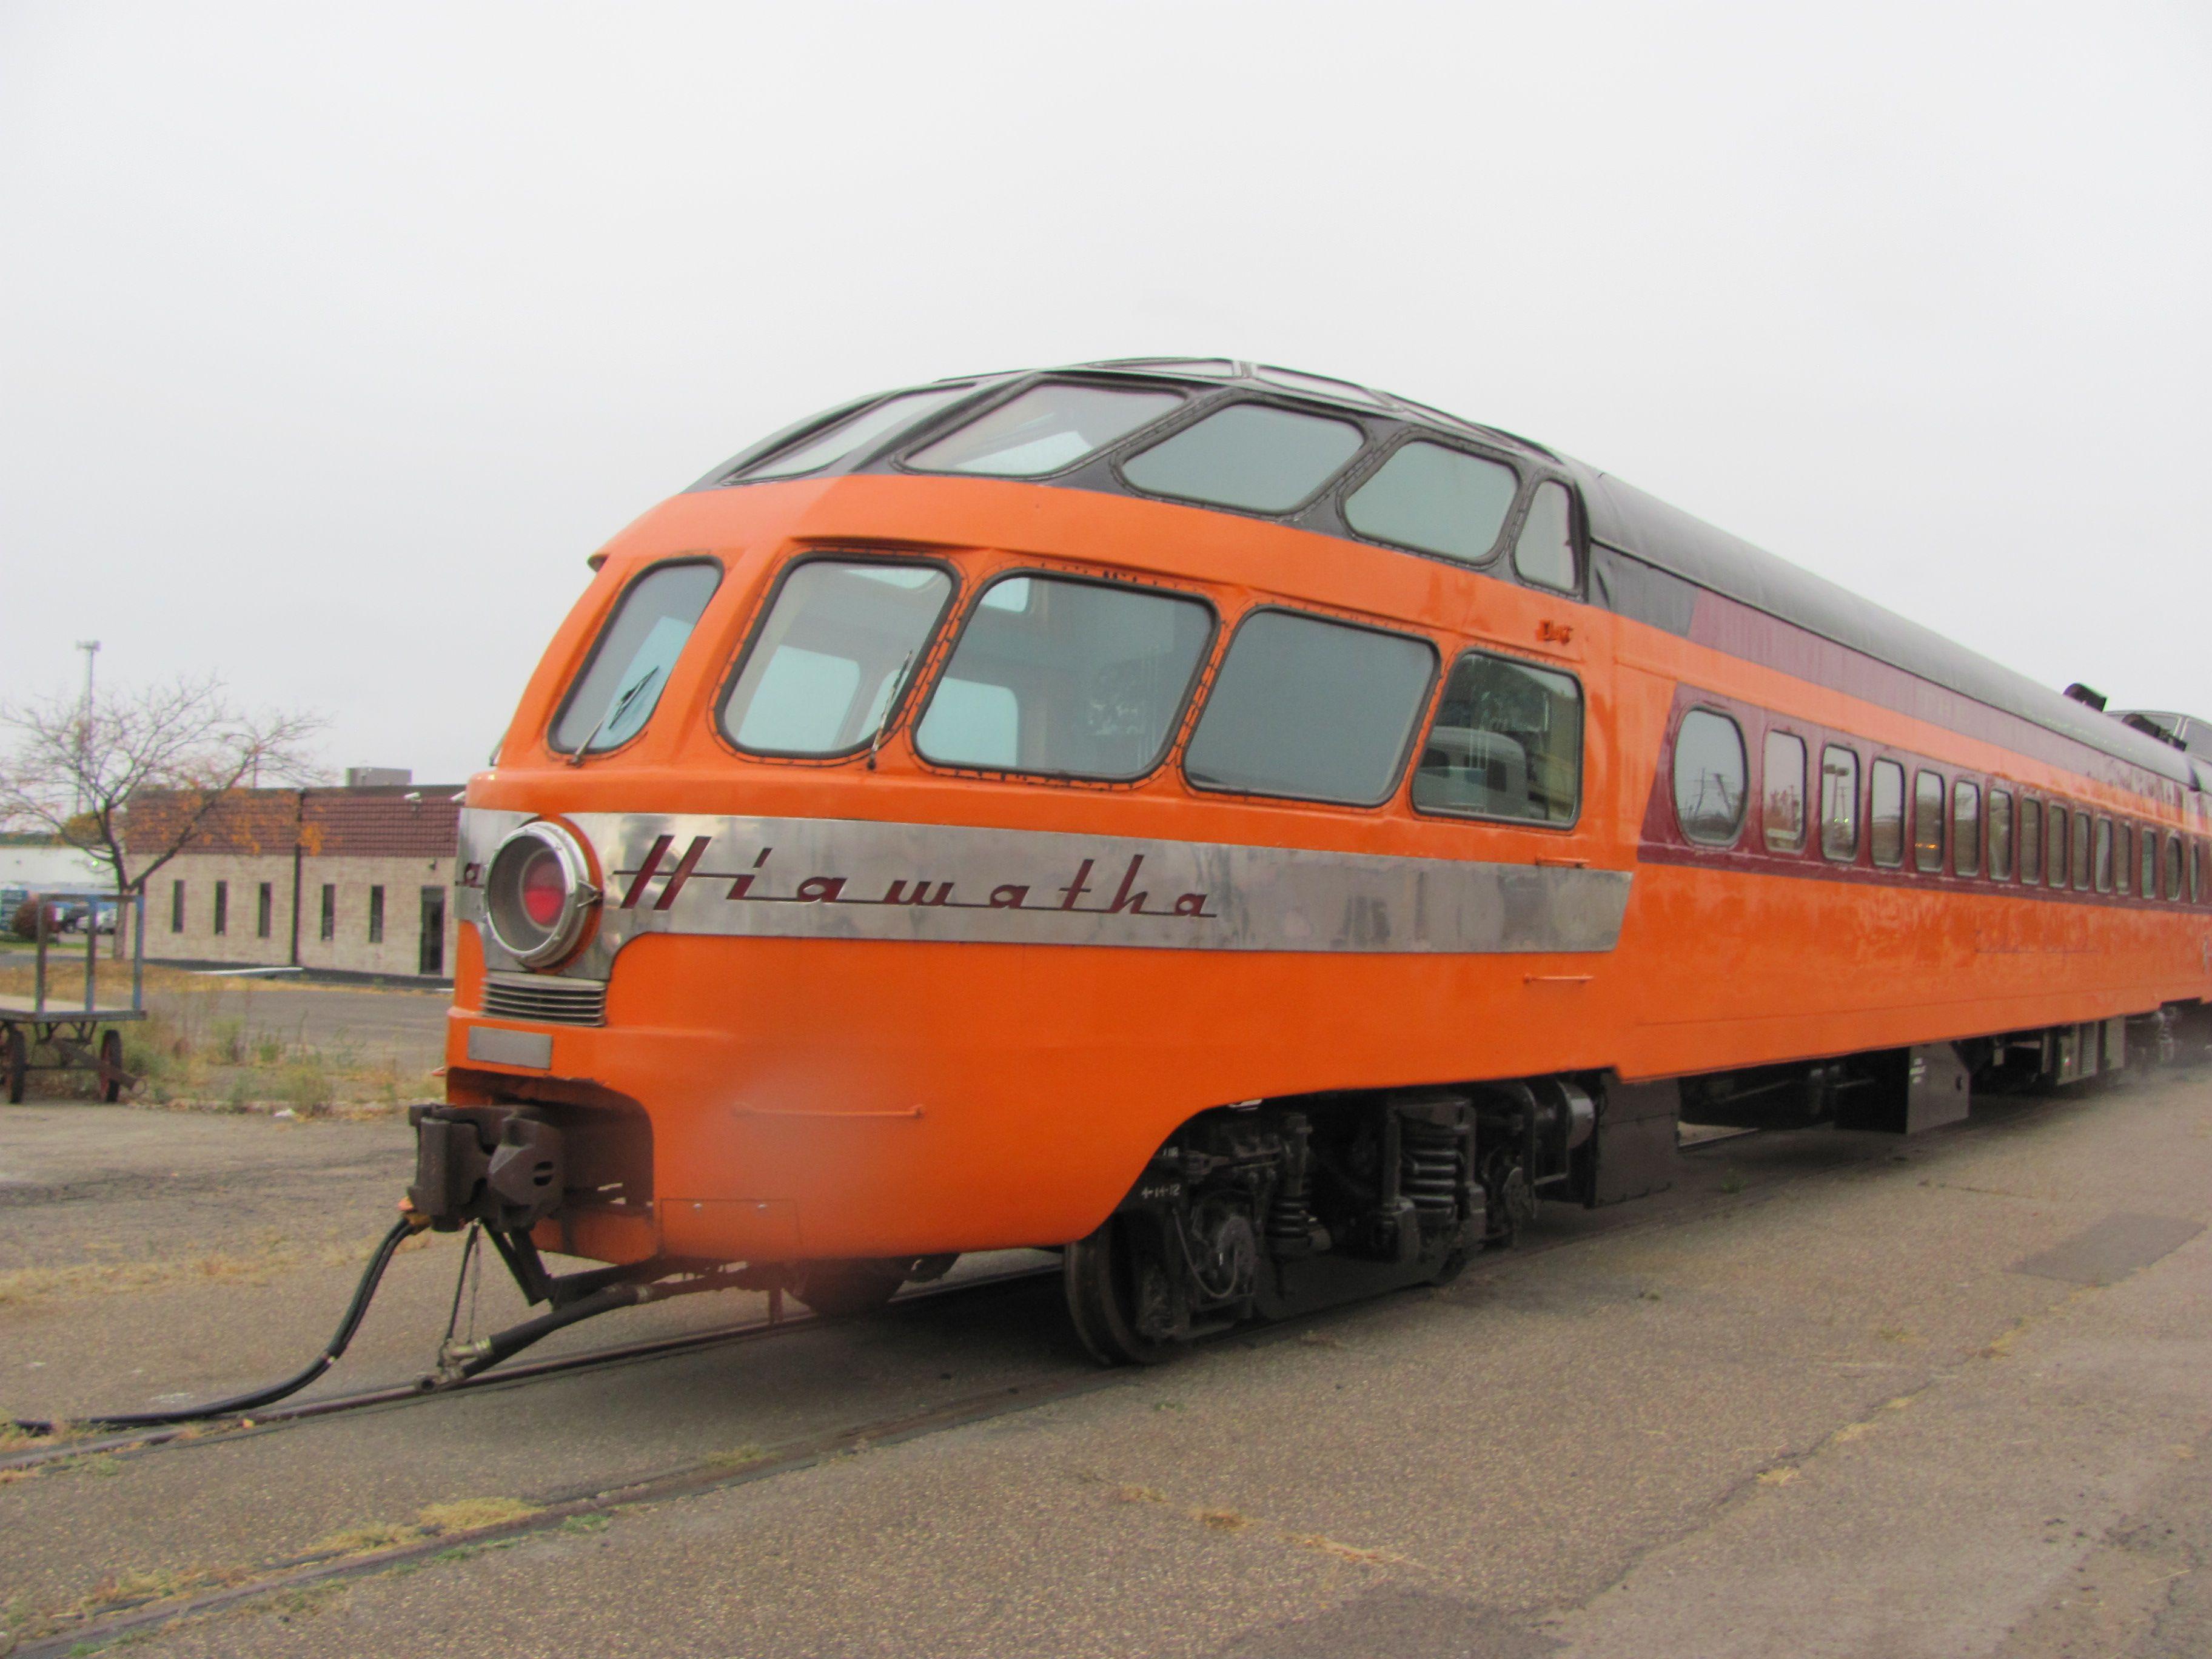 Skytop Lounge train